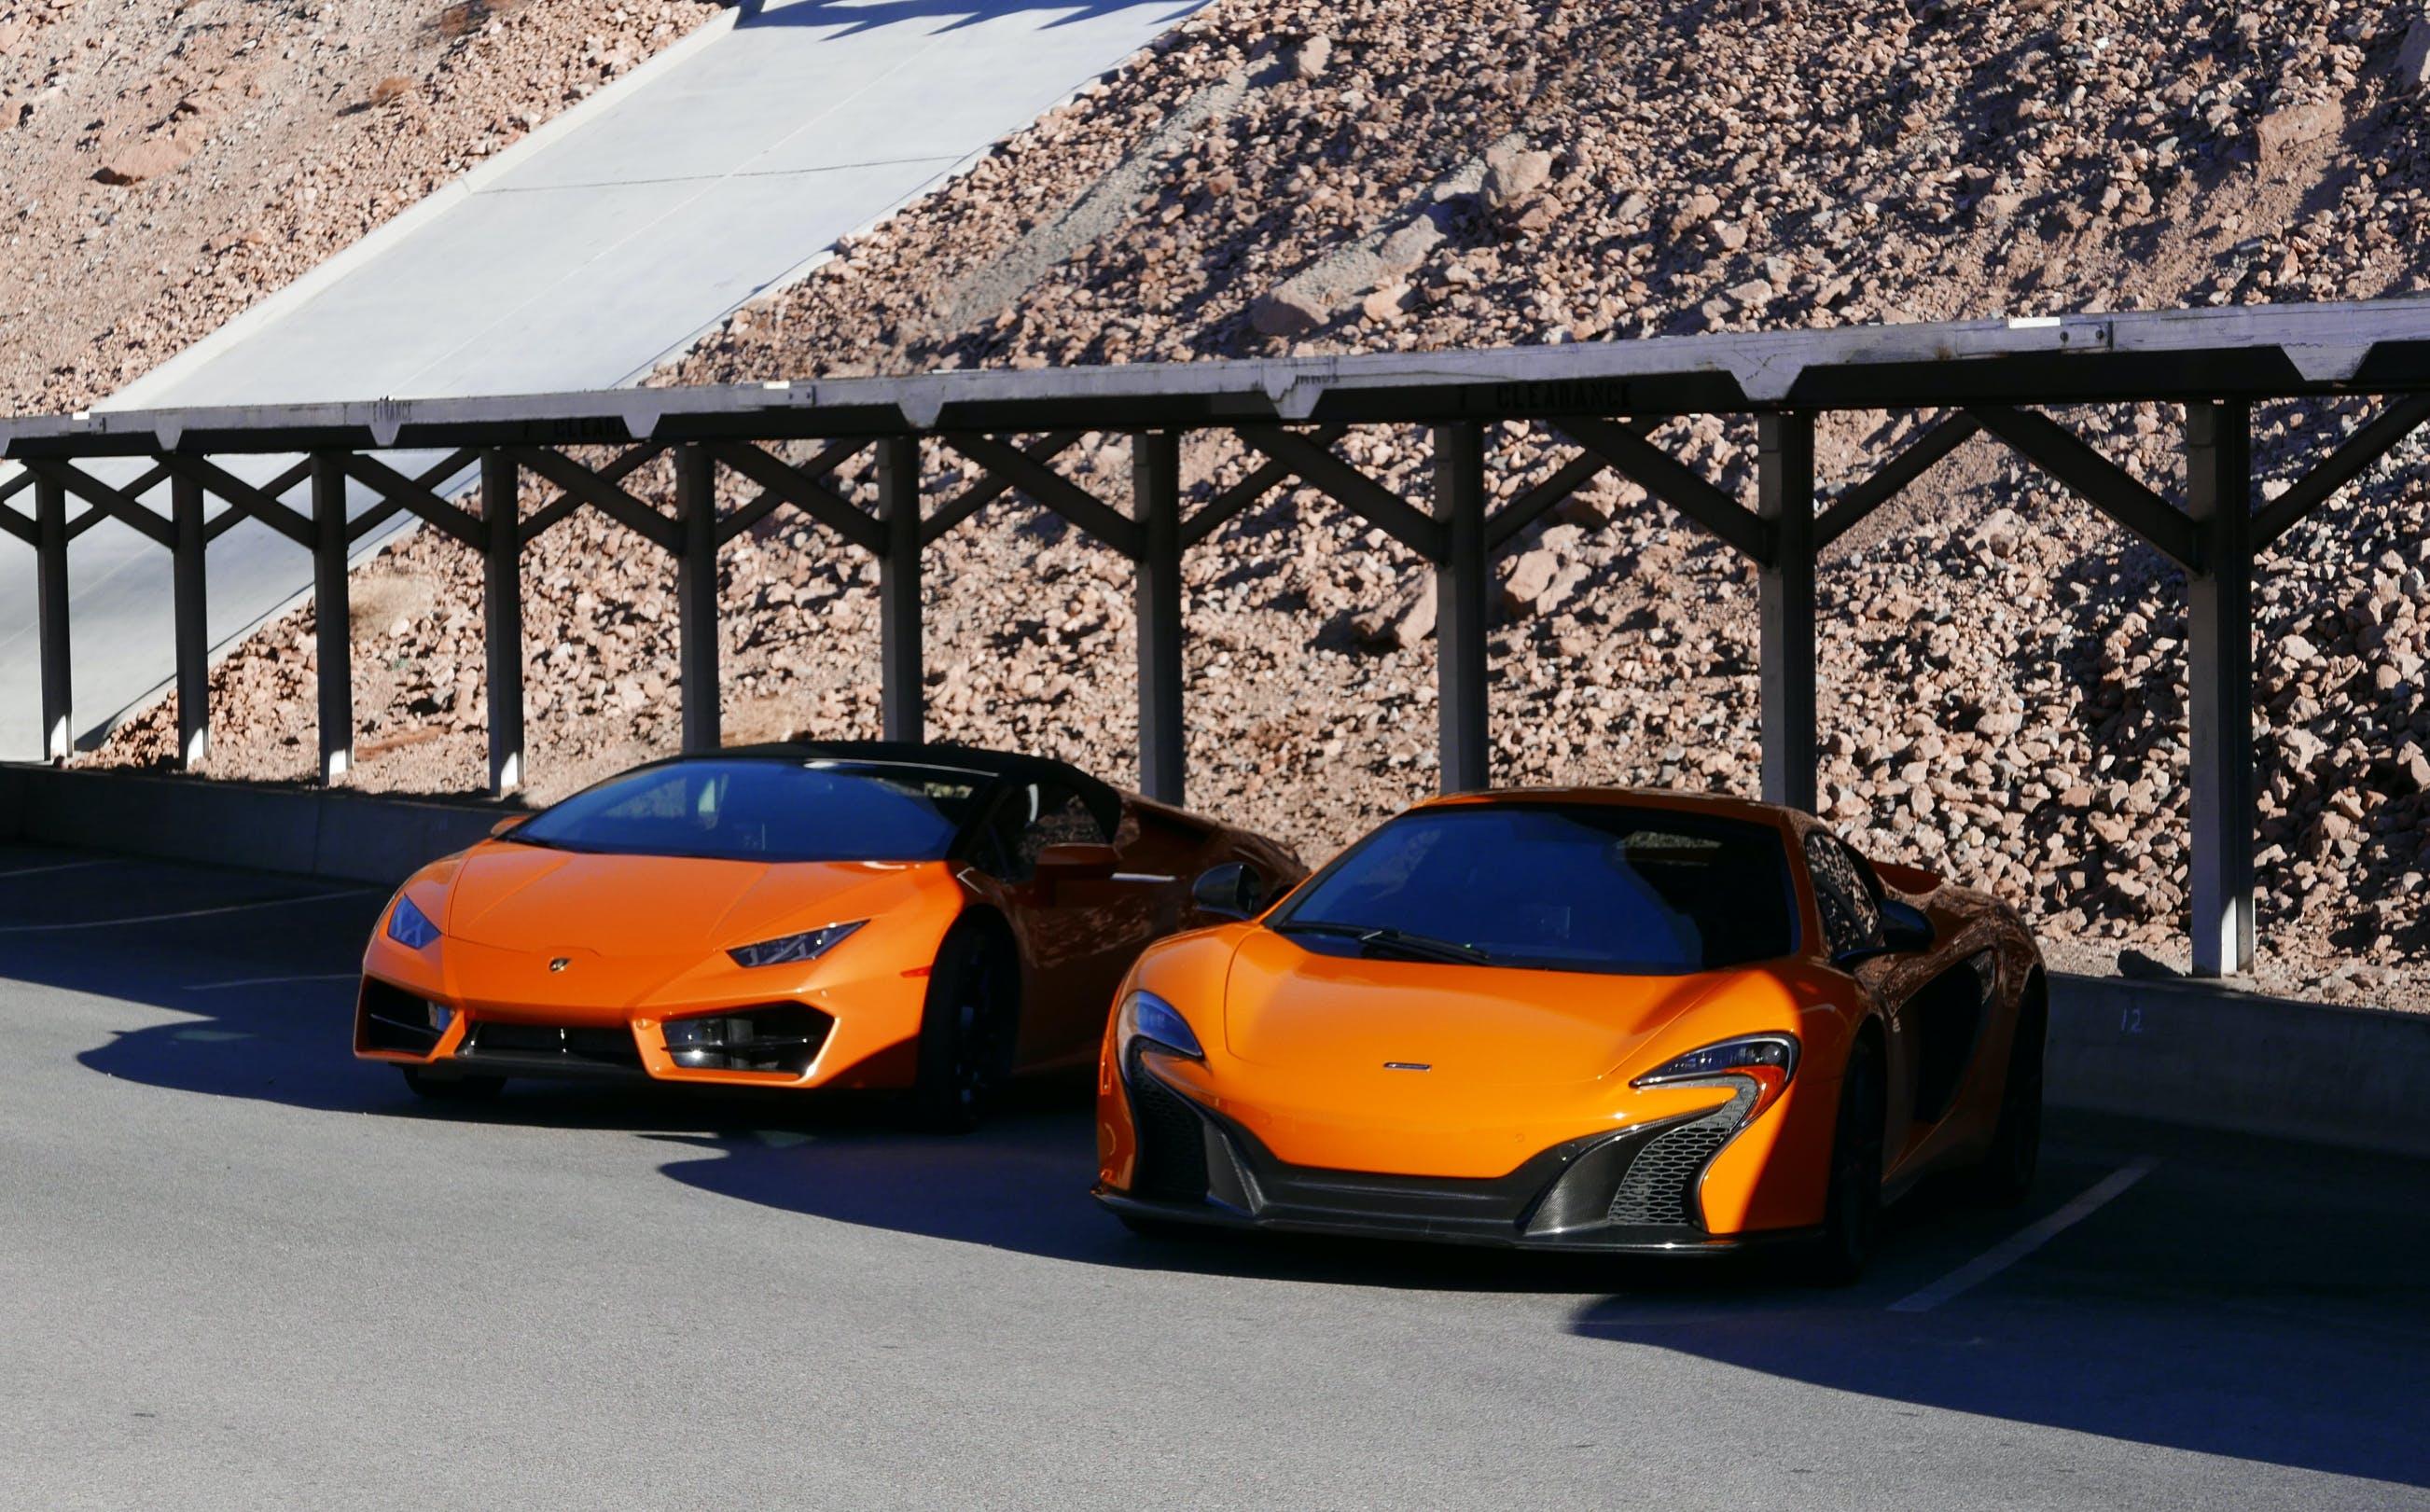 Free stock photo of cars, road, vehicles, luxury